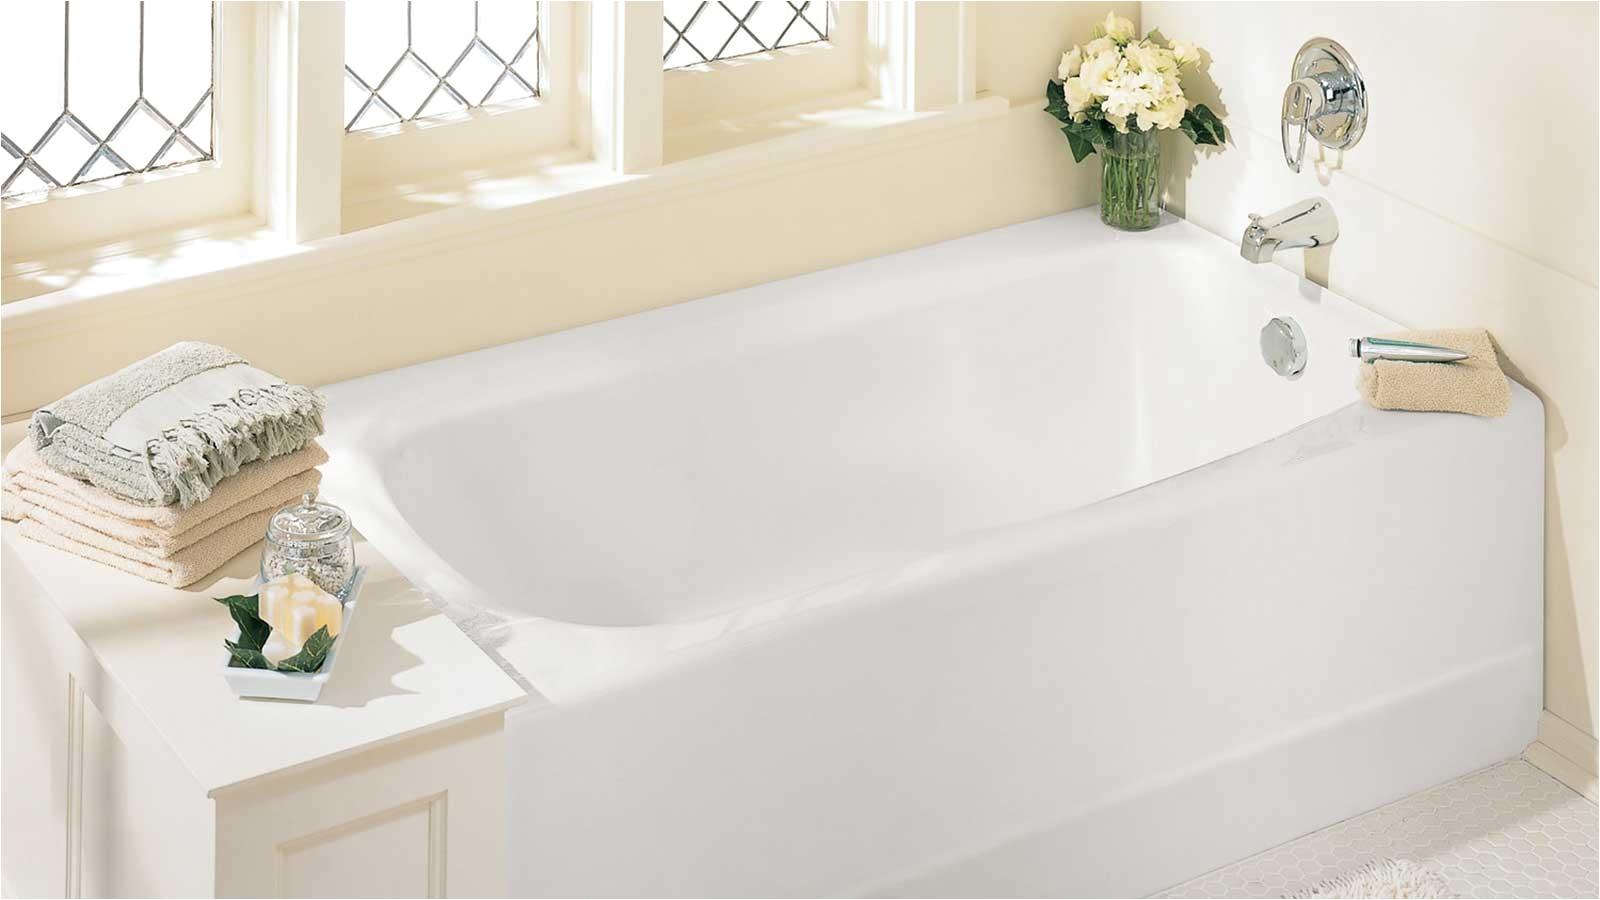 standard bathtub depth bootz tubs bootzcast bathtub reviews